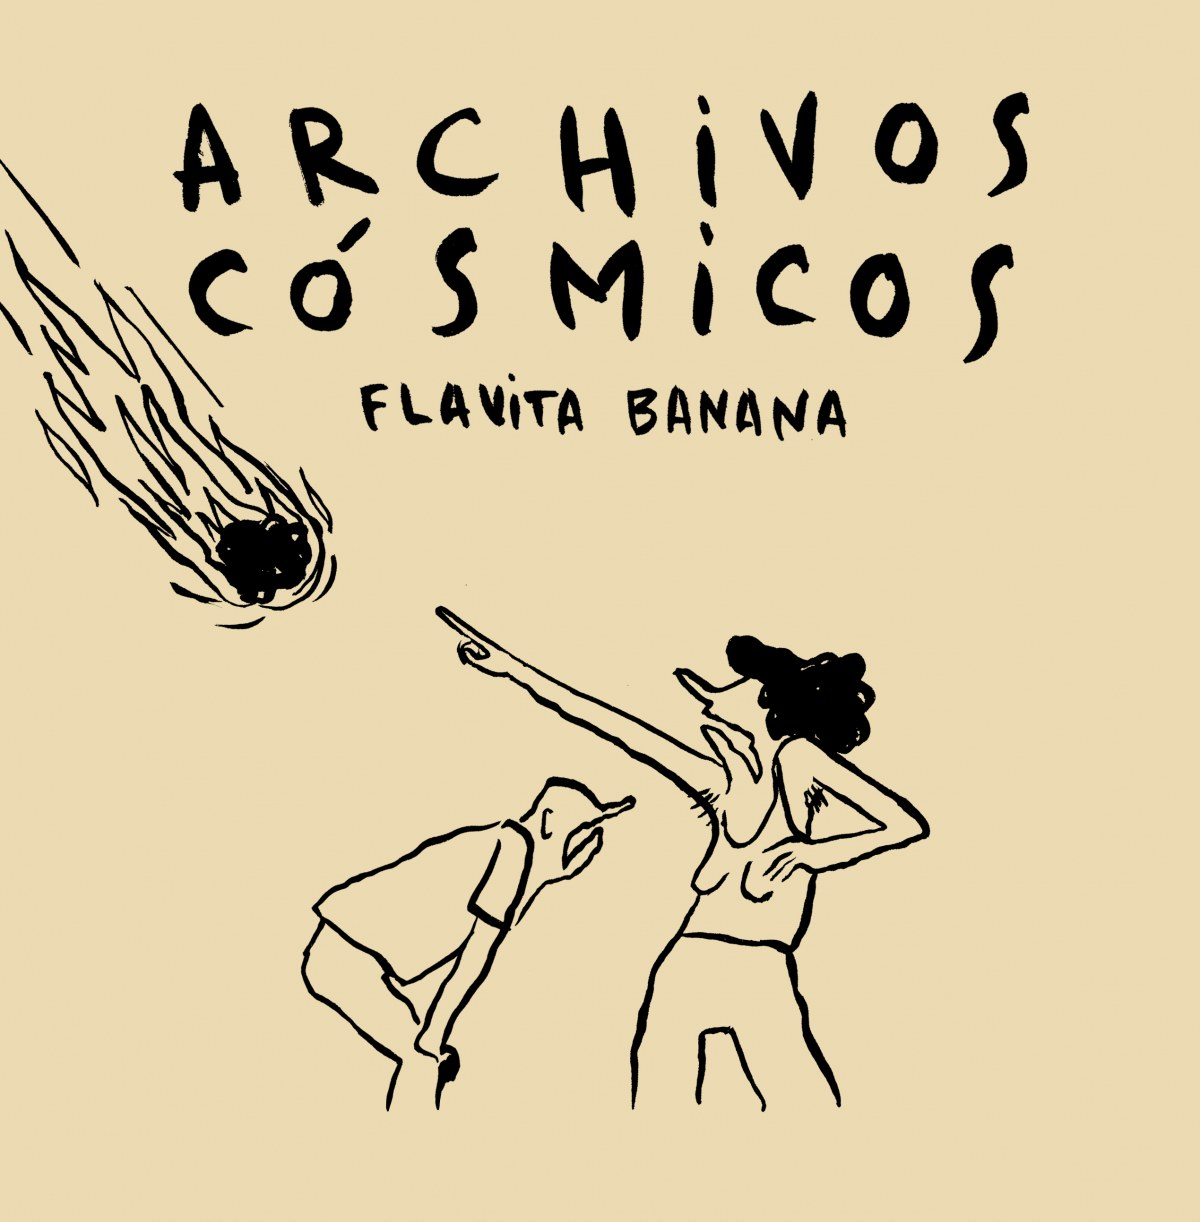 Archivos Cósmicos Zaracopy